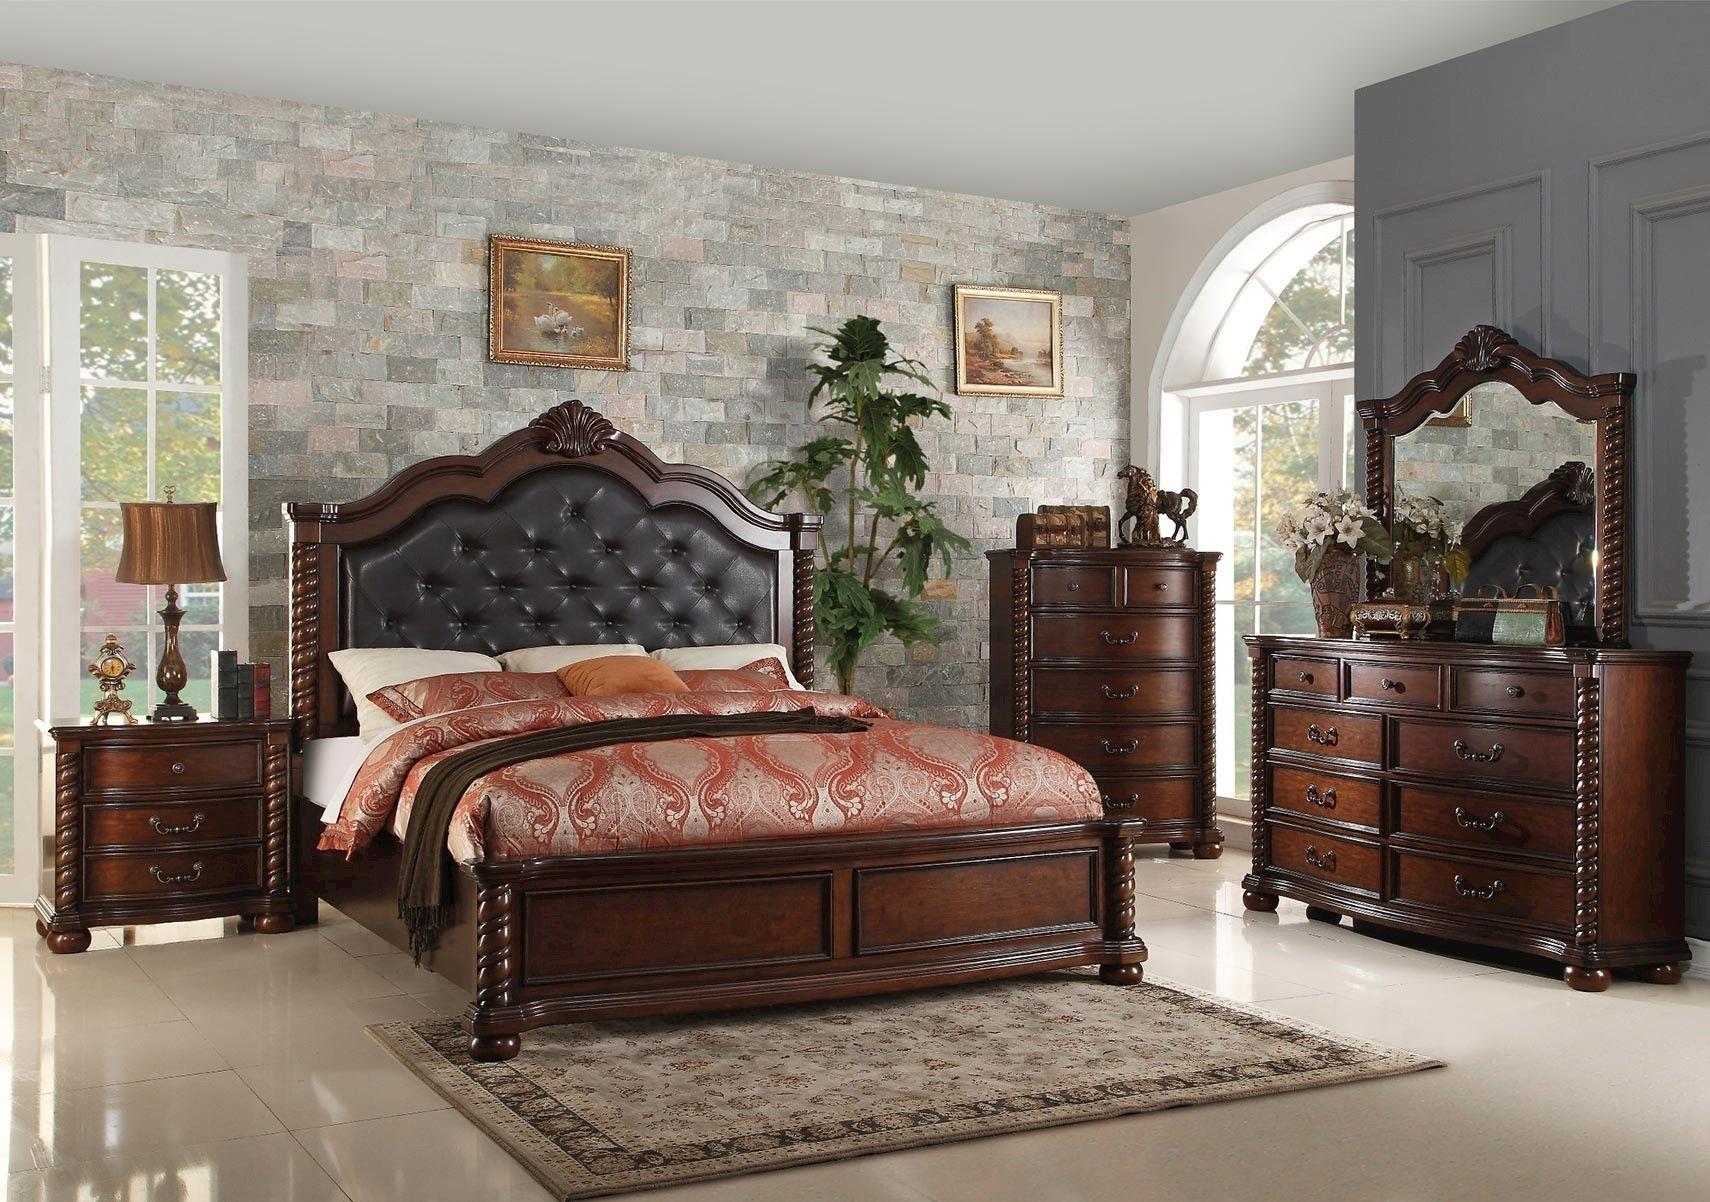 Lacks | Montarosa 4 Pc Queen Bedroom Set